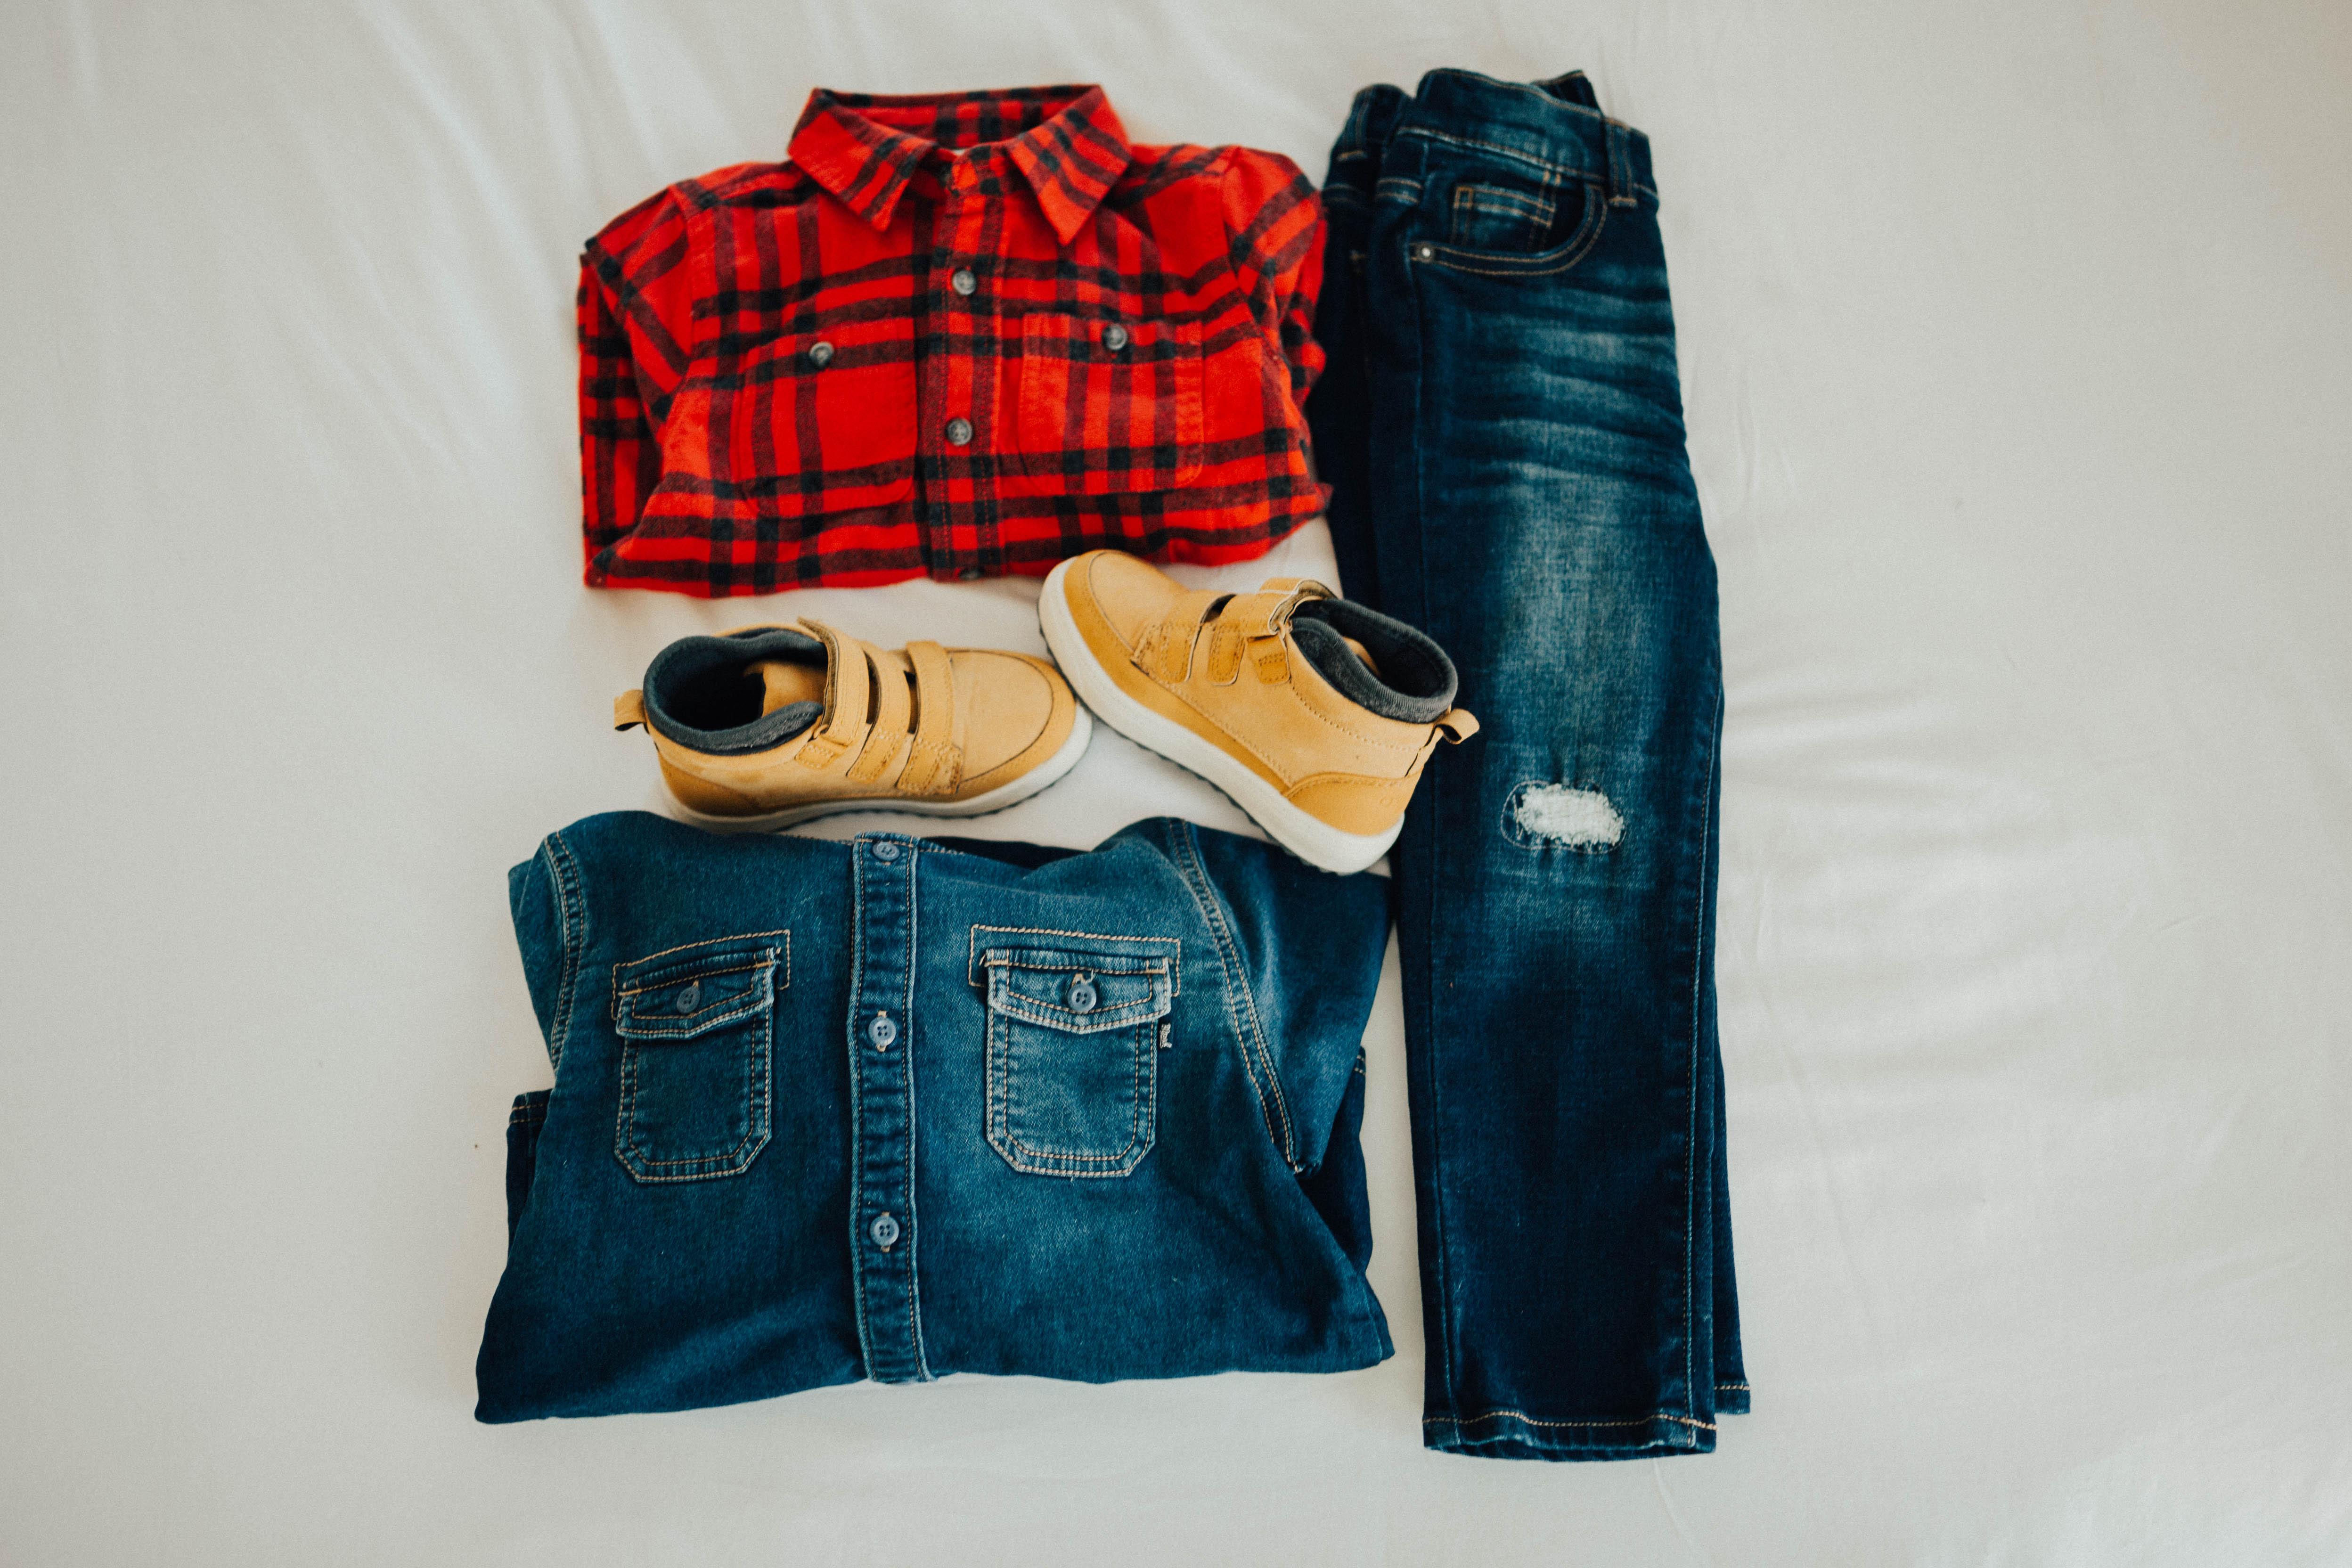 He's Going To Preschool! - King's Favorite Preschool Clothes by Utah fashion blogger Dani Marie Blog